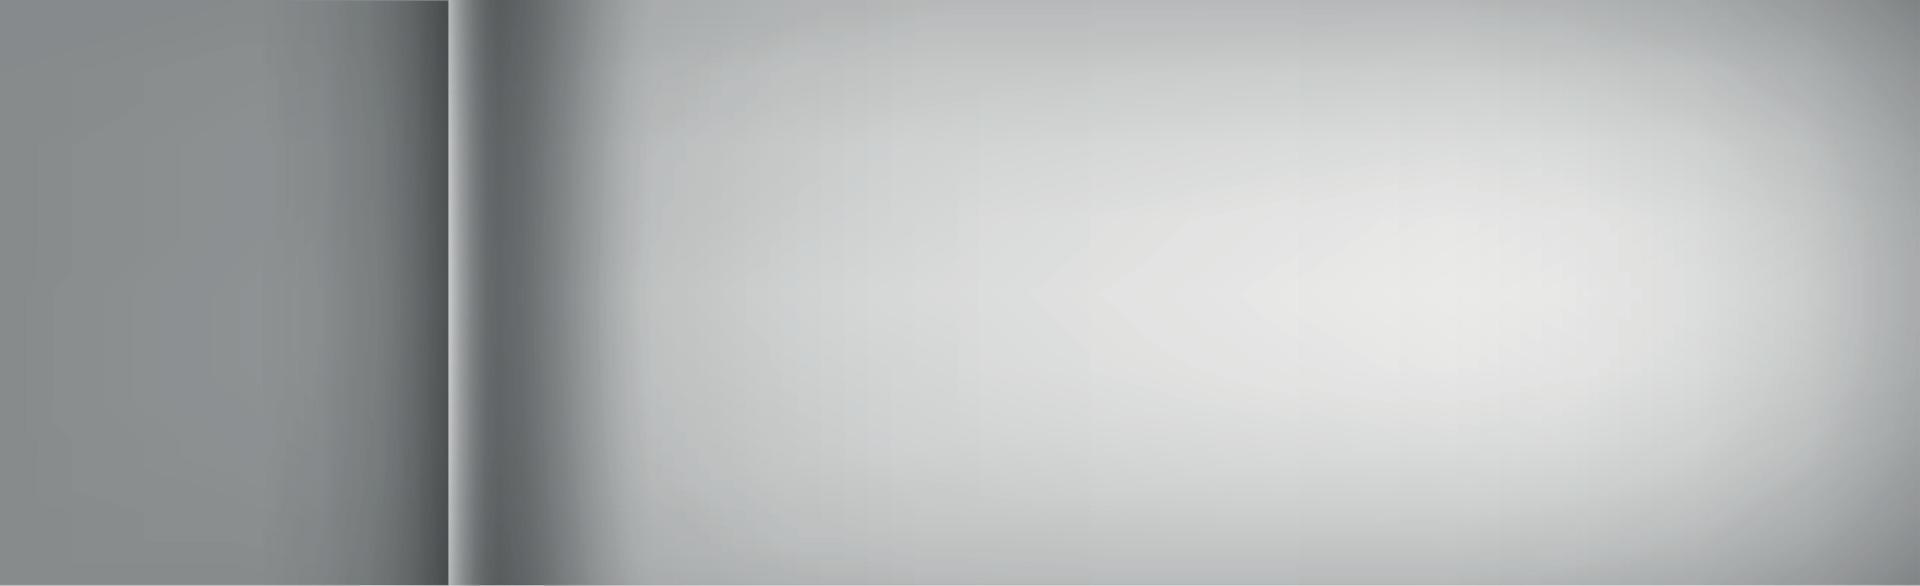 fundo branco e cinza com borda ondulada - vetor